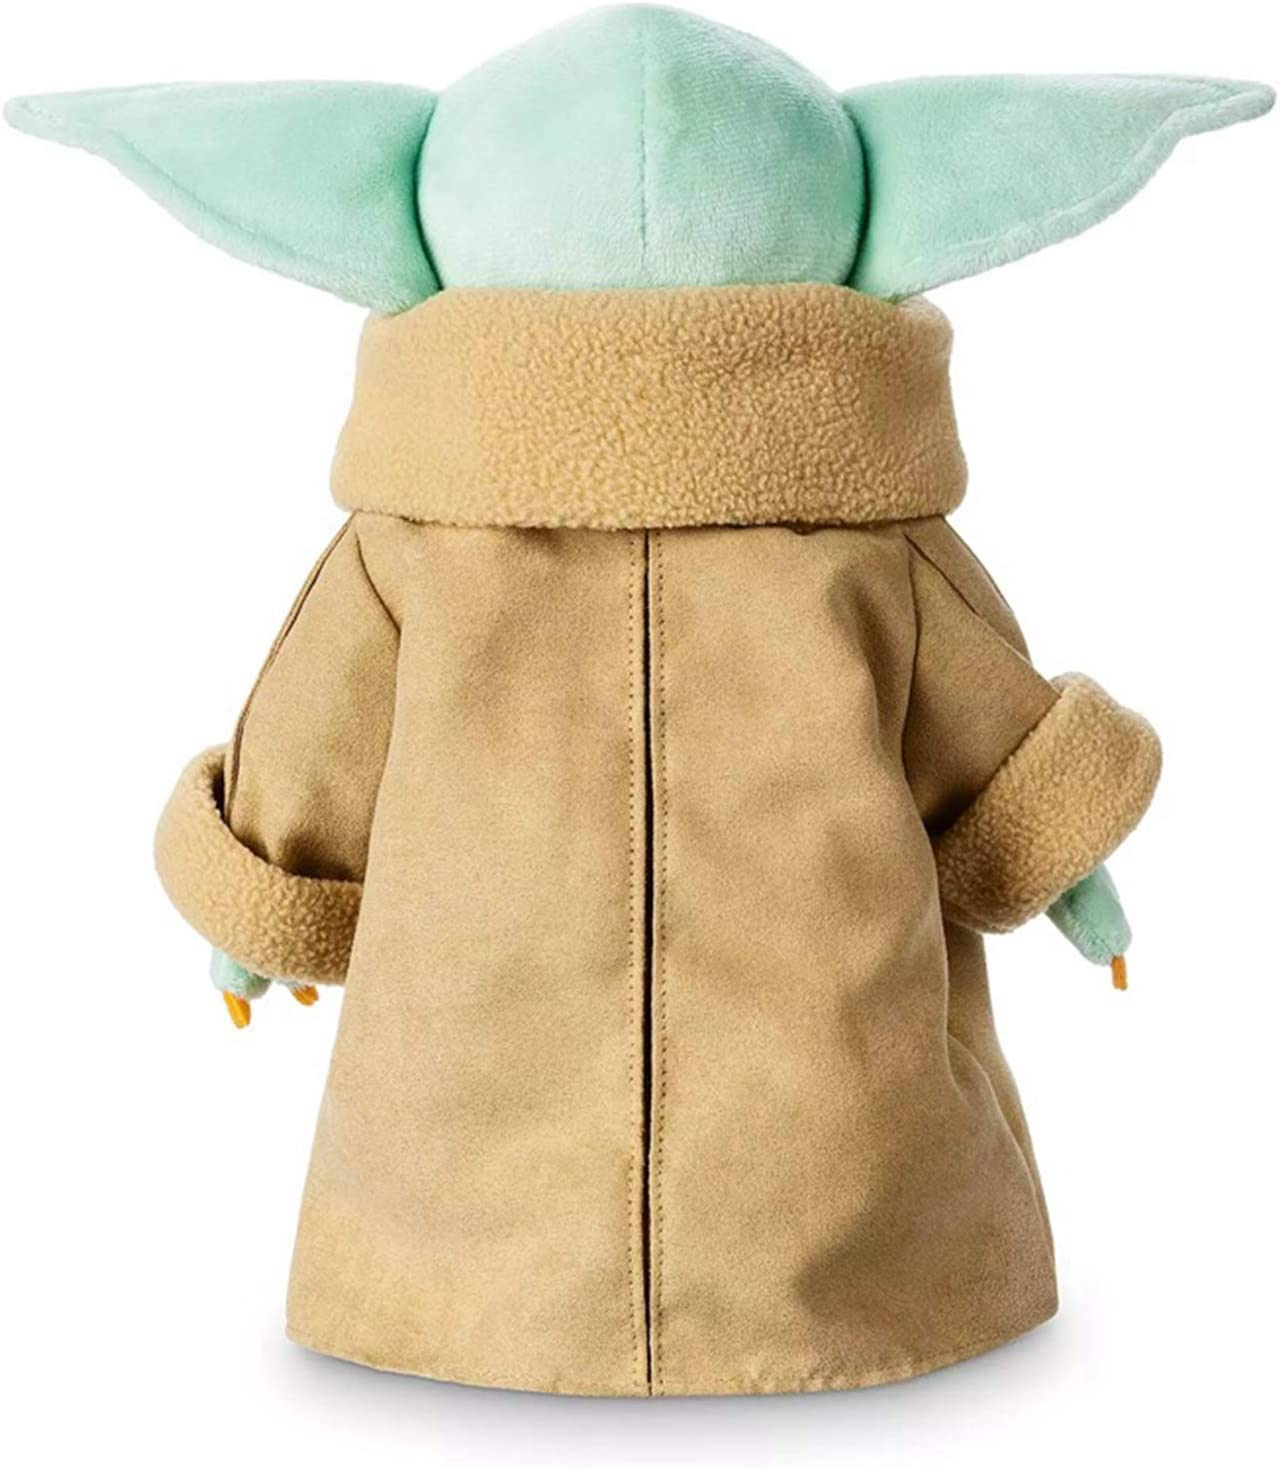 Baby Yoda Plush Toys,Baby Plush Figures Baby Stuffed Animal 11 Inch Baby Yoda Stuffed Animal Baby Yoda Doll from Mandalorian Plush Baby Yoda The Child Yoda Plush